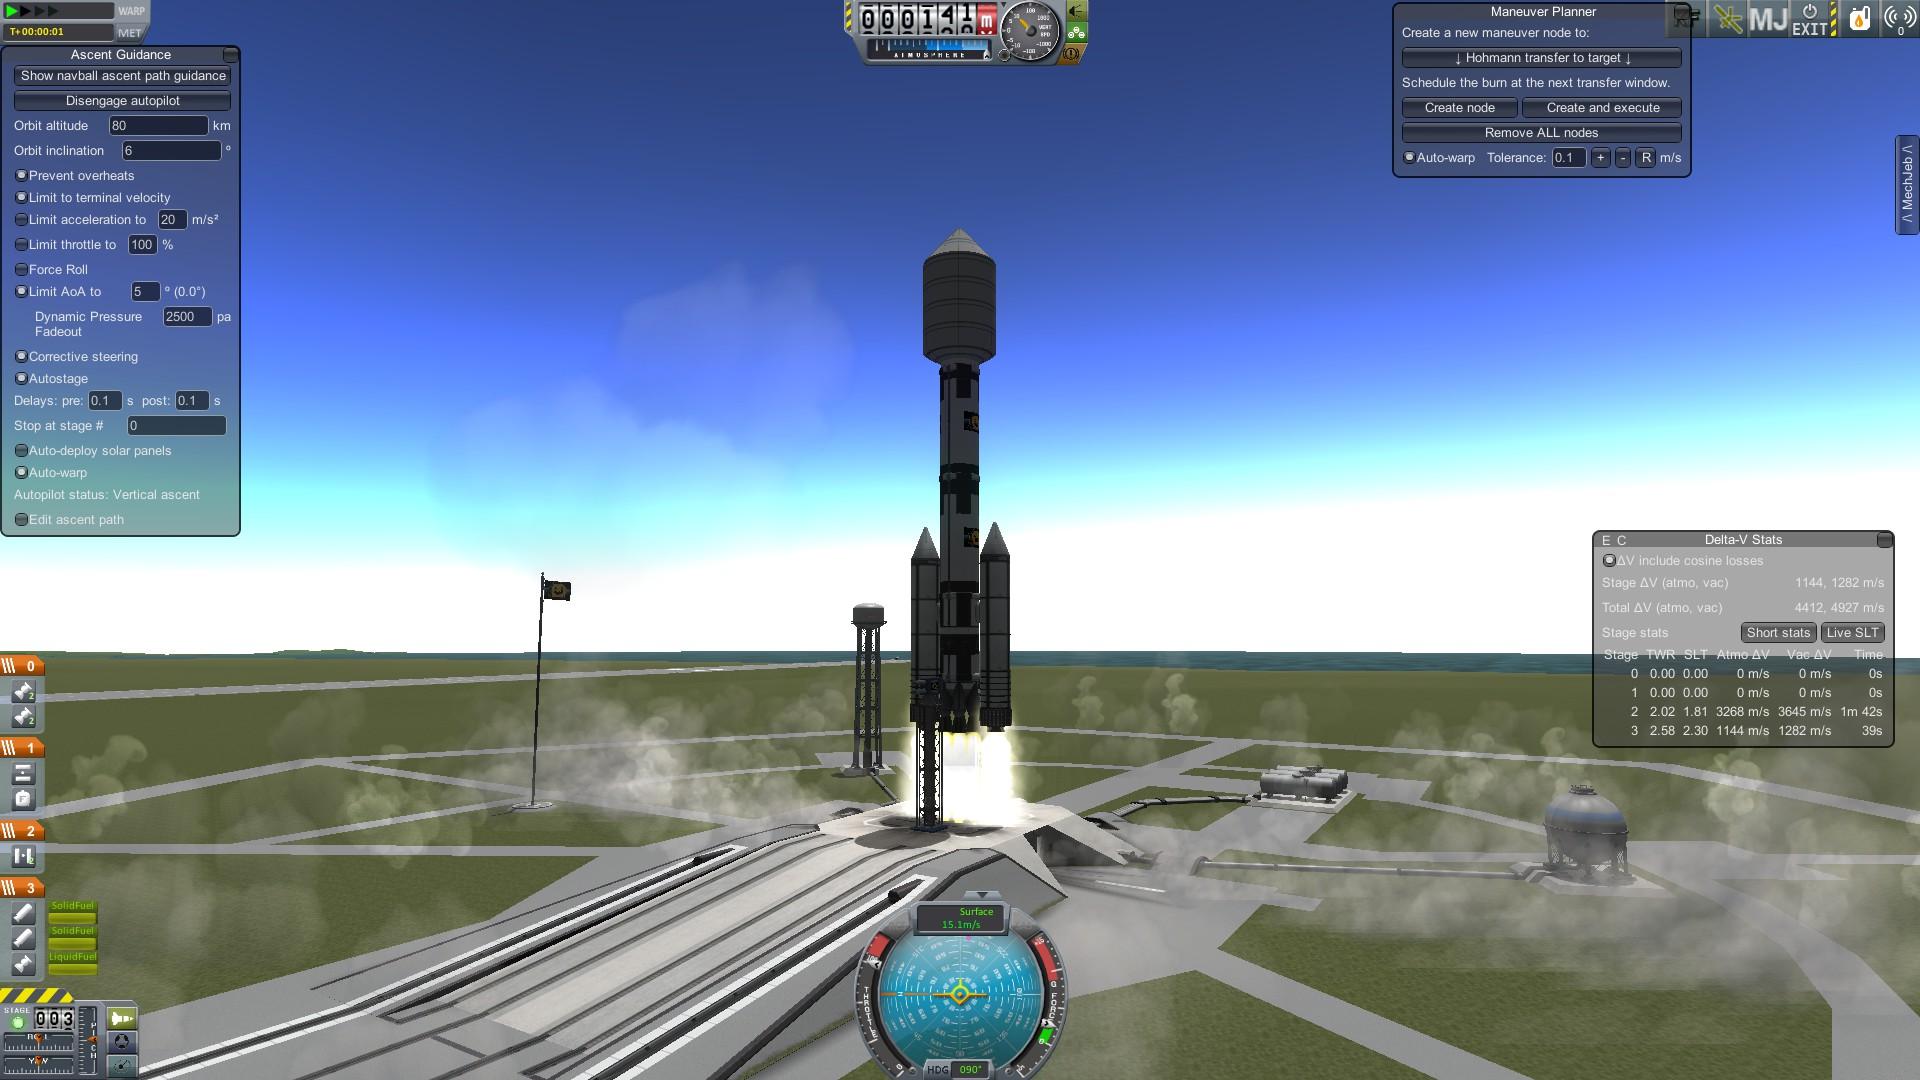 Kerbal Space Program v1 0: No Longer Prematurely Deployed - The